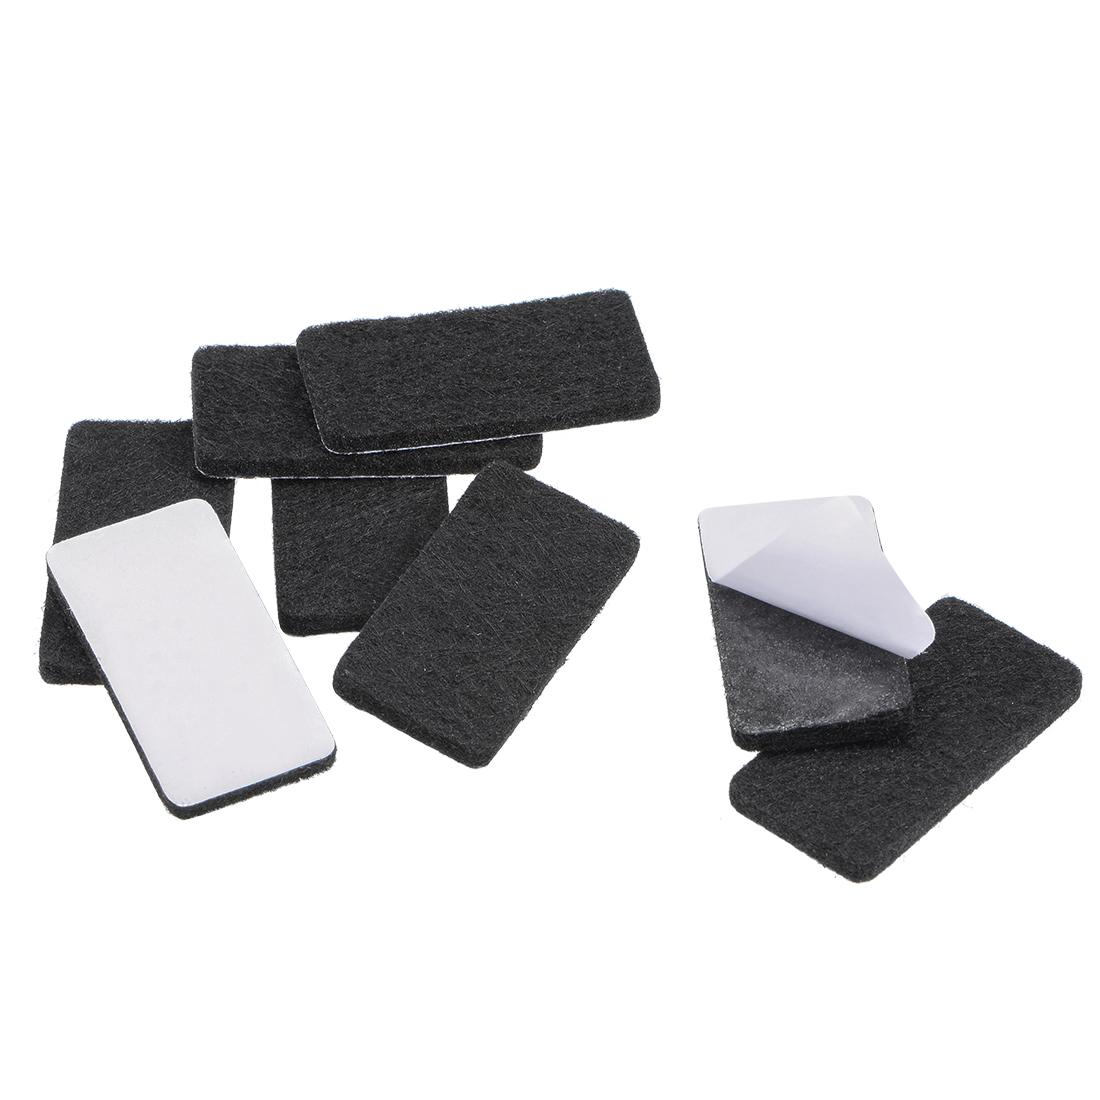 Furniture Pads 40mm x 20mm Adhesive Felt Pads 3mm Thick Black 8Pcs